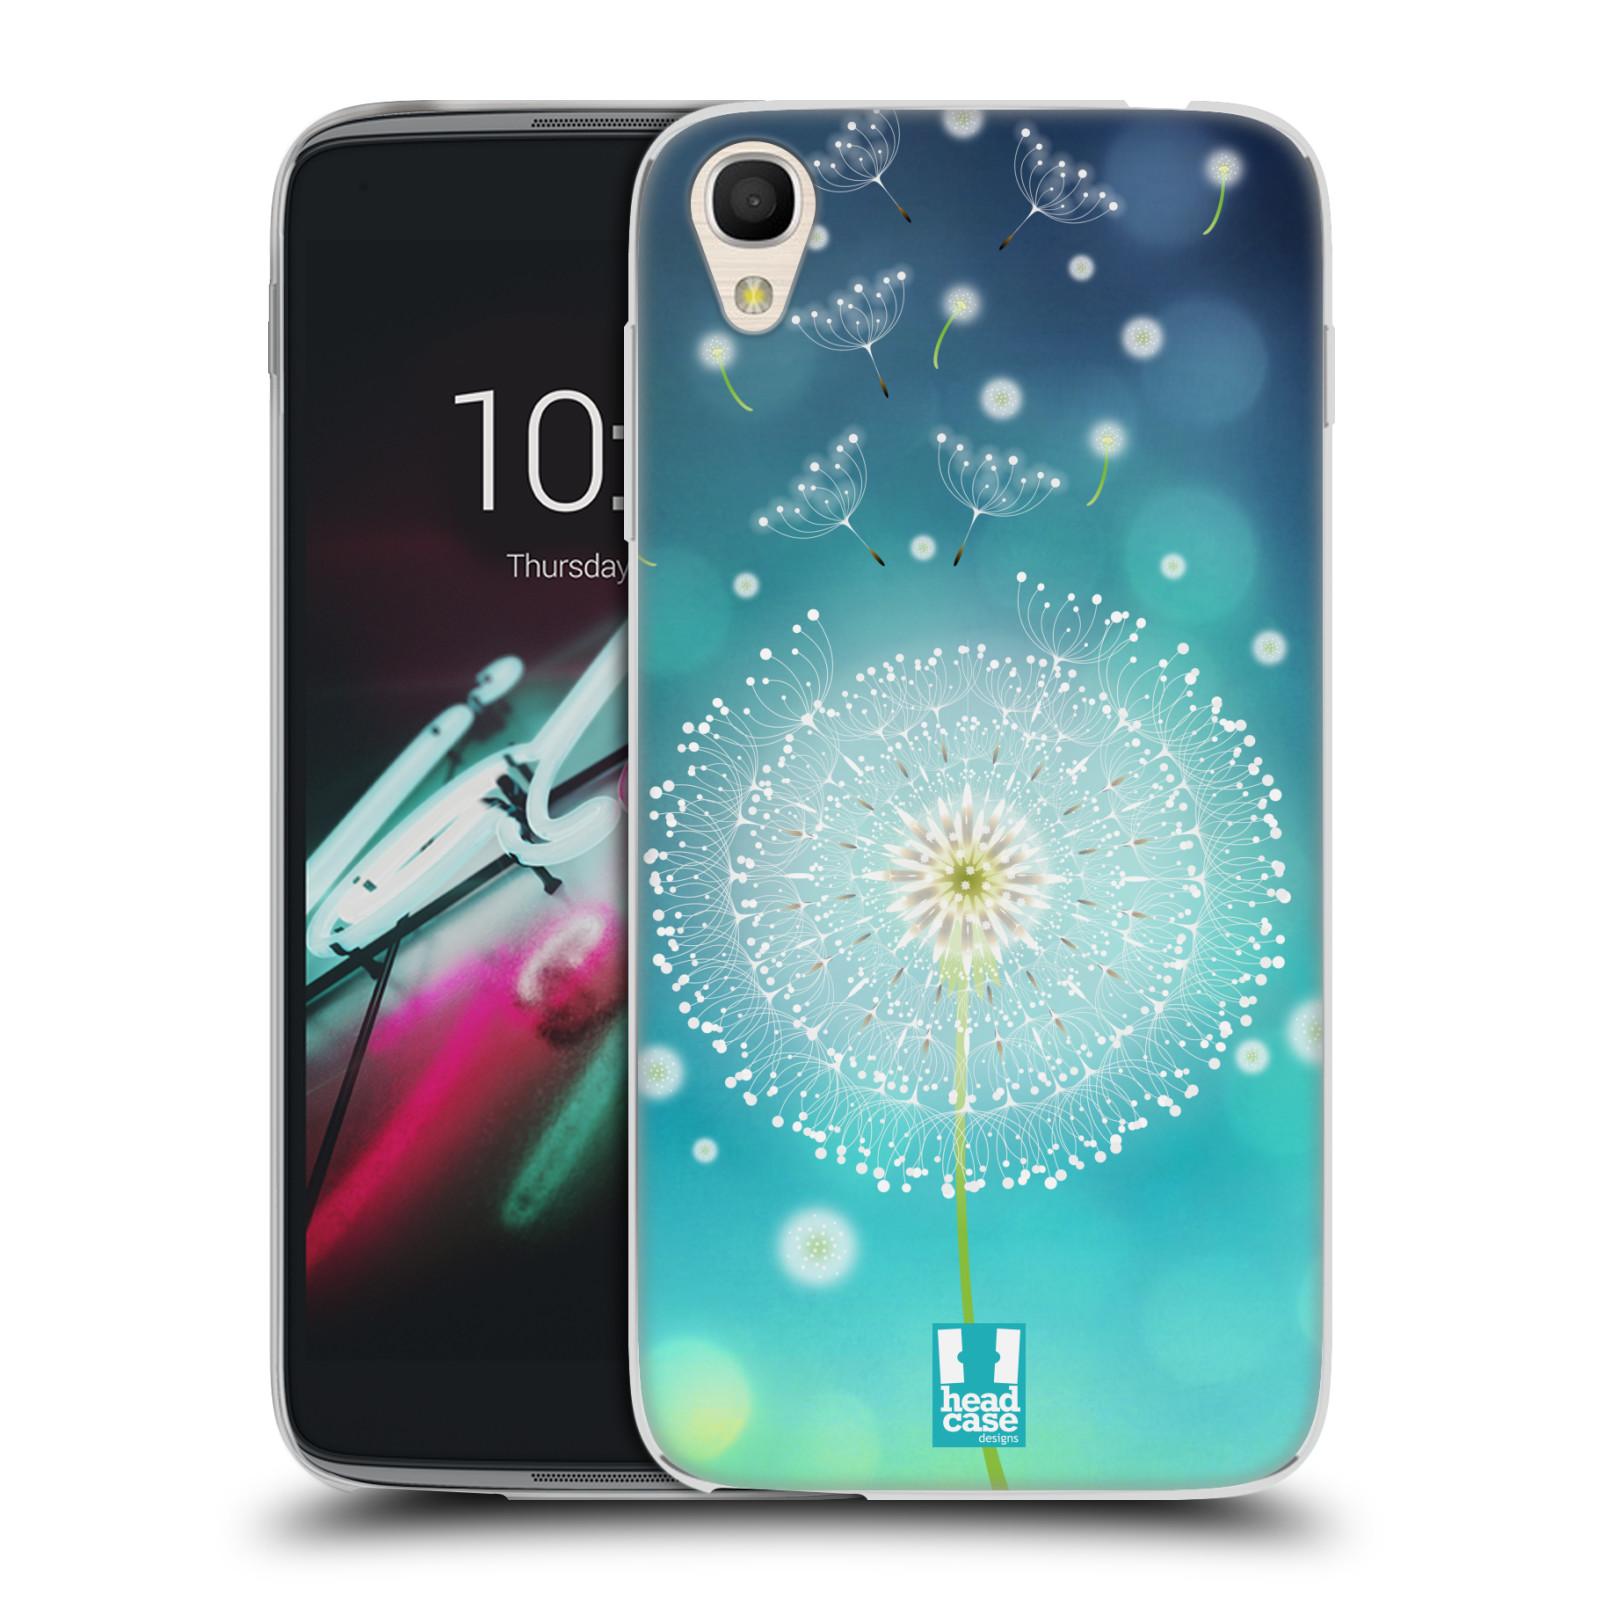 "Silikonové pouzdro na mobil Alcatel One Touch 6039Y Idol 3 HEAD CASE Rozlétaná pampeliška (Silikonový kryt či obal na mobilní telefon Alcatel One Touch Idol 3 OT-6039Y s 4,7"" displejem)"